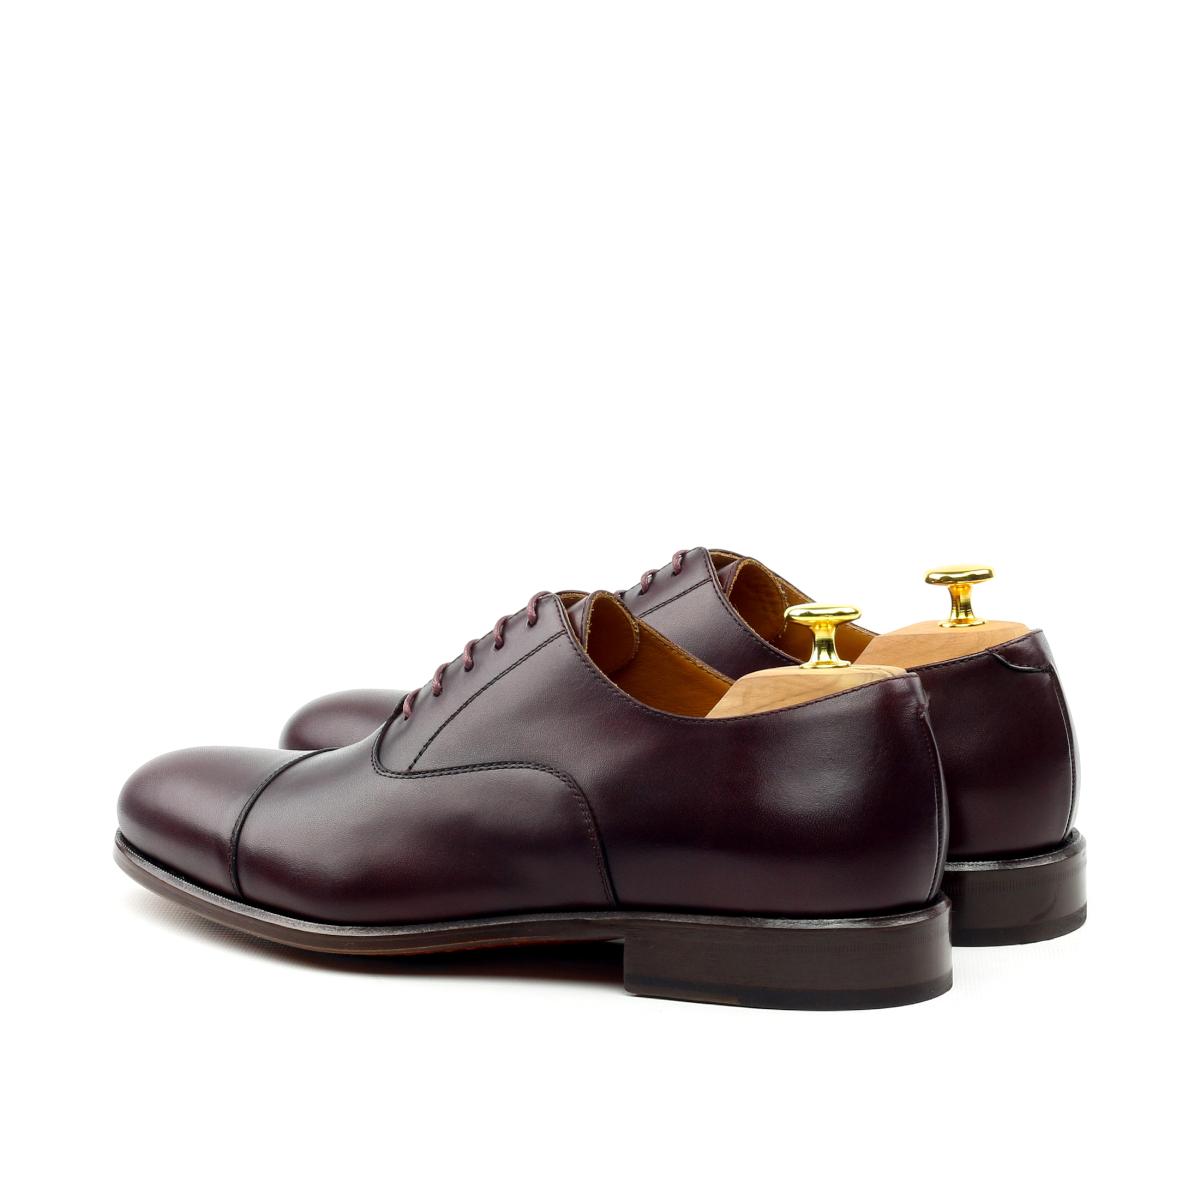 Burgundy cap toe Oxford